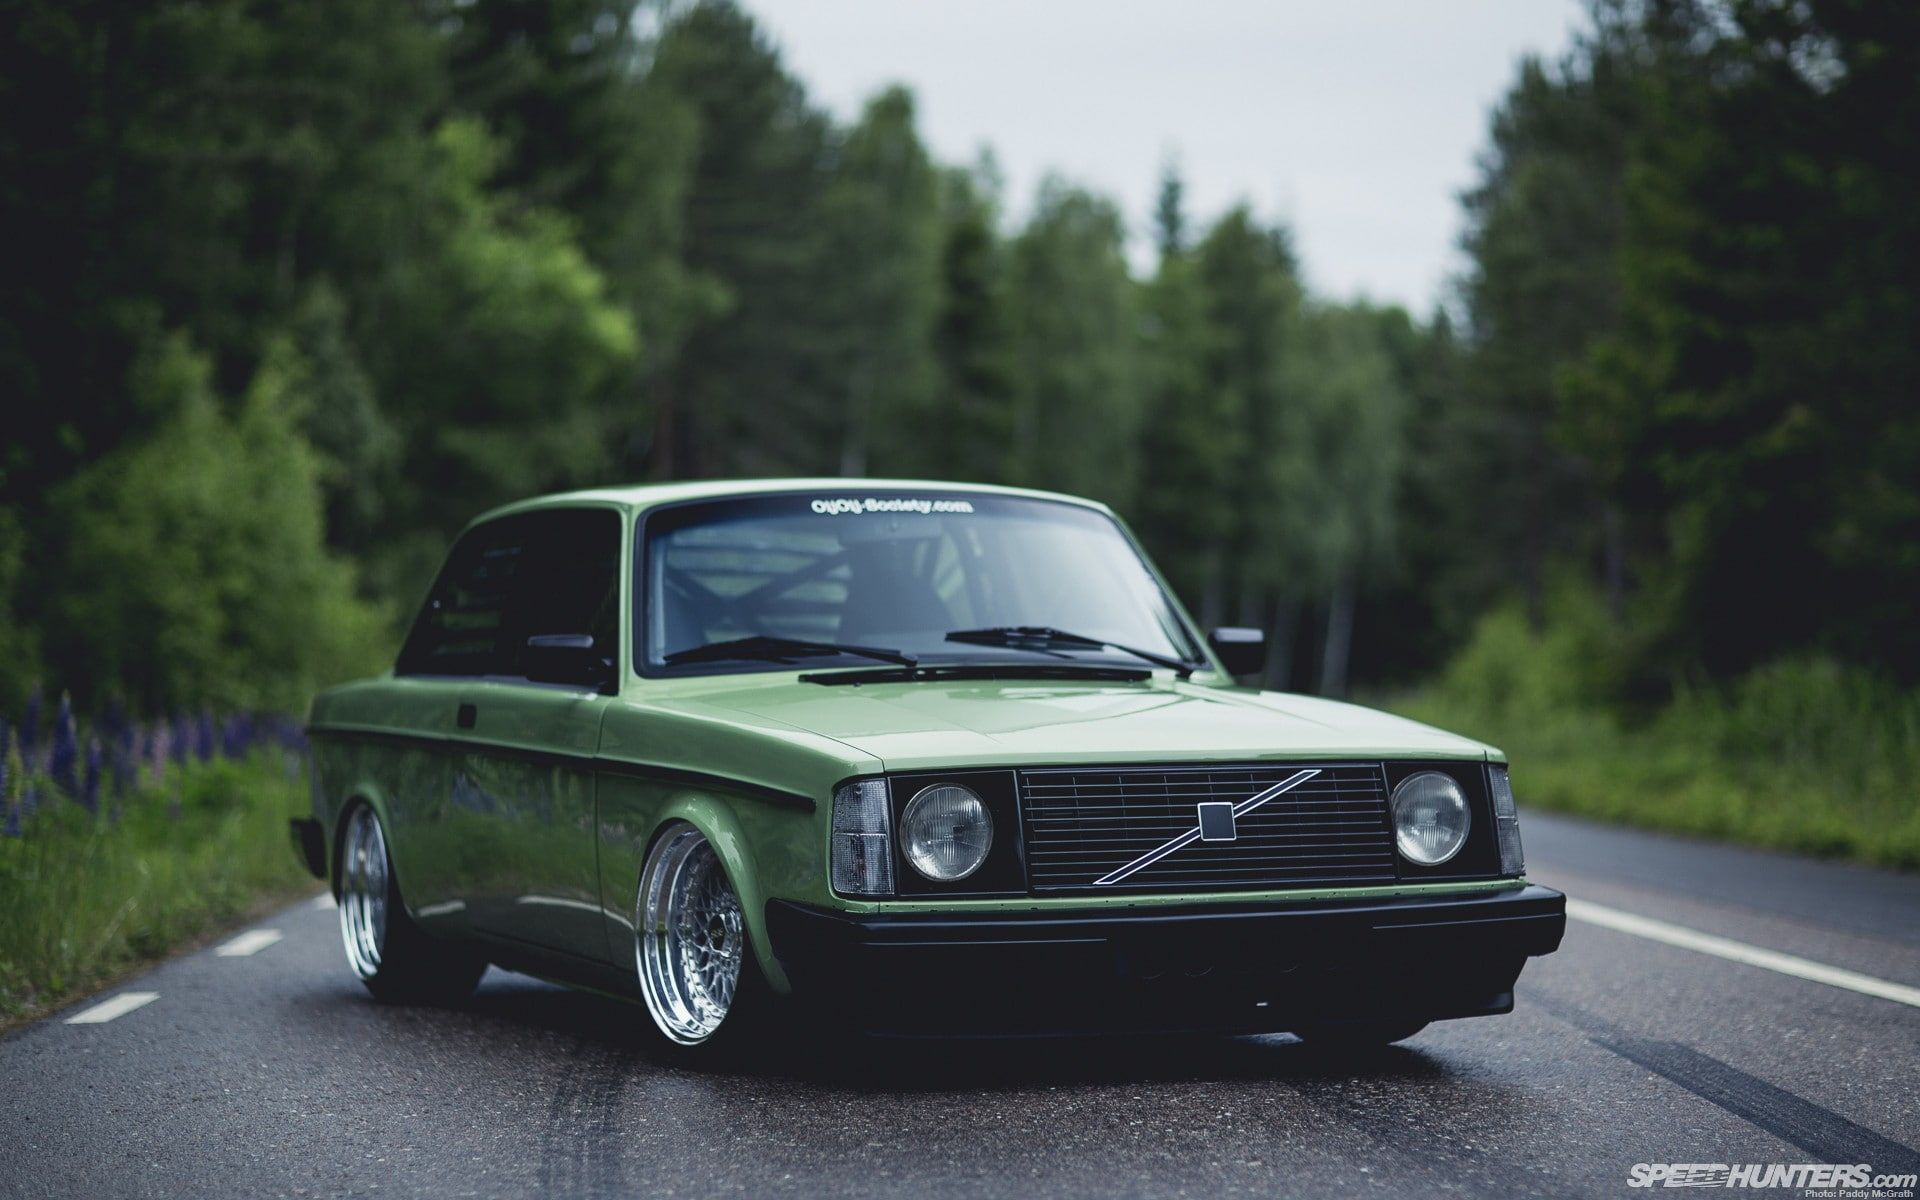 Bbs Green Stance Volvo 240 Road Volvo Car Trees 1080p Wallpaper Hdwallpaper Desktop Volvo 240 Old Volvo Volvo 740